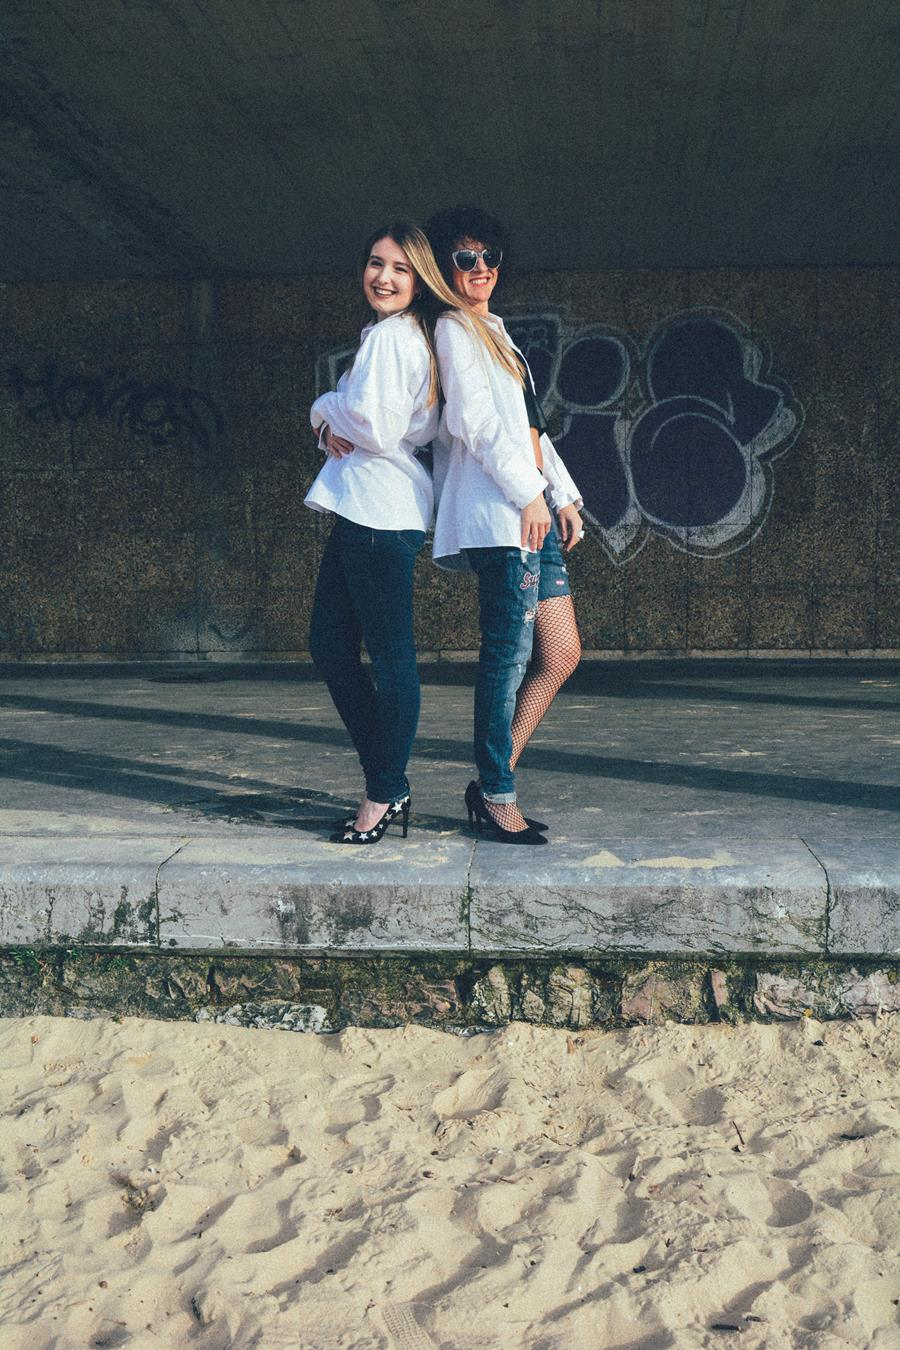 Rebeca Valdivia, Natalia Aldasoro, Miss Clov, Personal Shopper, Donostia, San Sebastián, colaboración bloggers, camisa blanca, white shirt, hells, stilettos, zapatos de salón, jeans, top, curls, curlspower, rizos